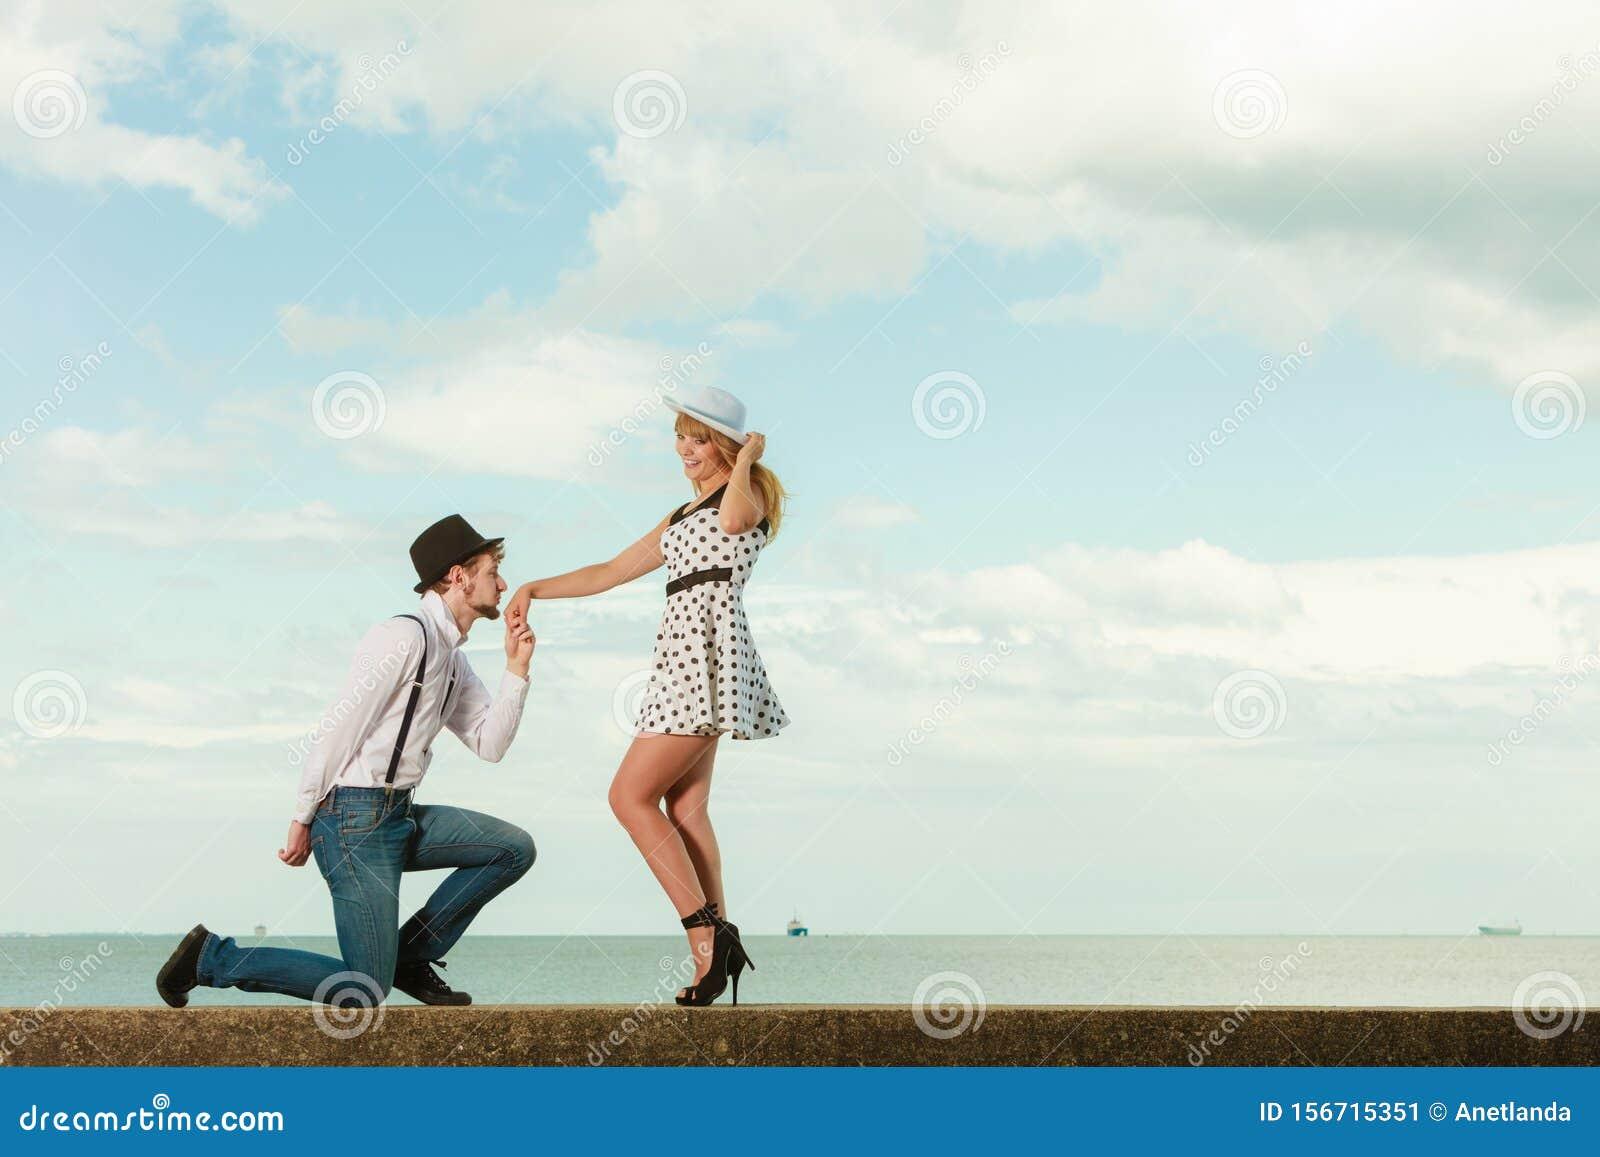 Retro dating